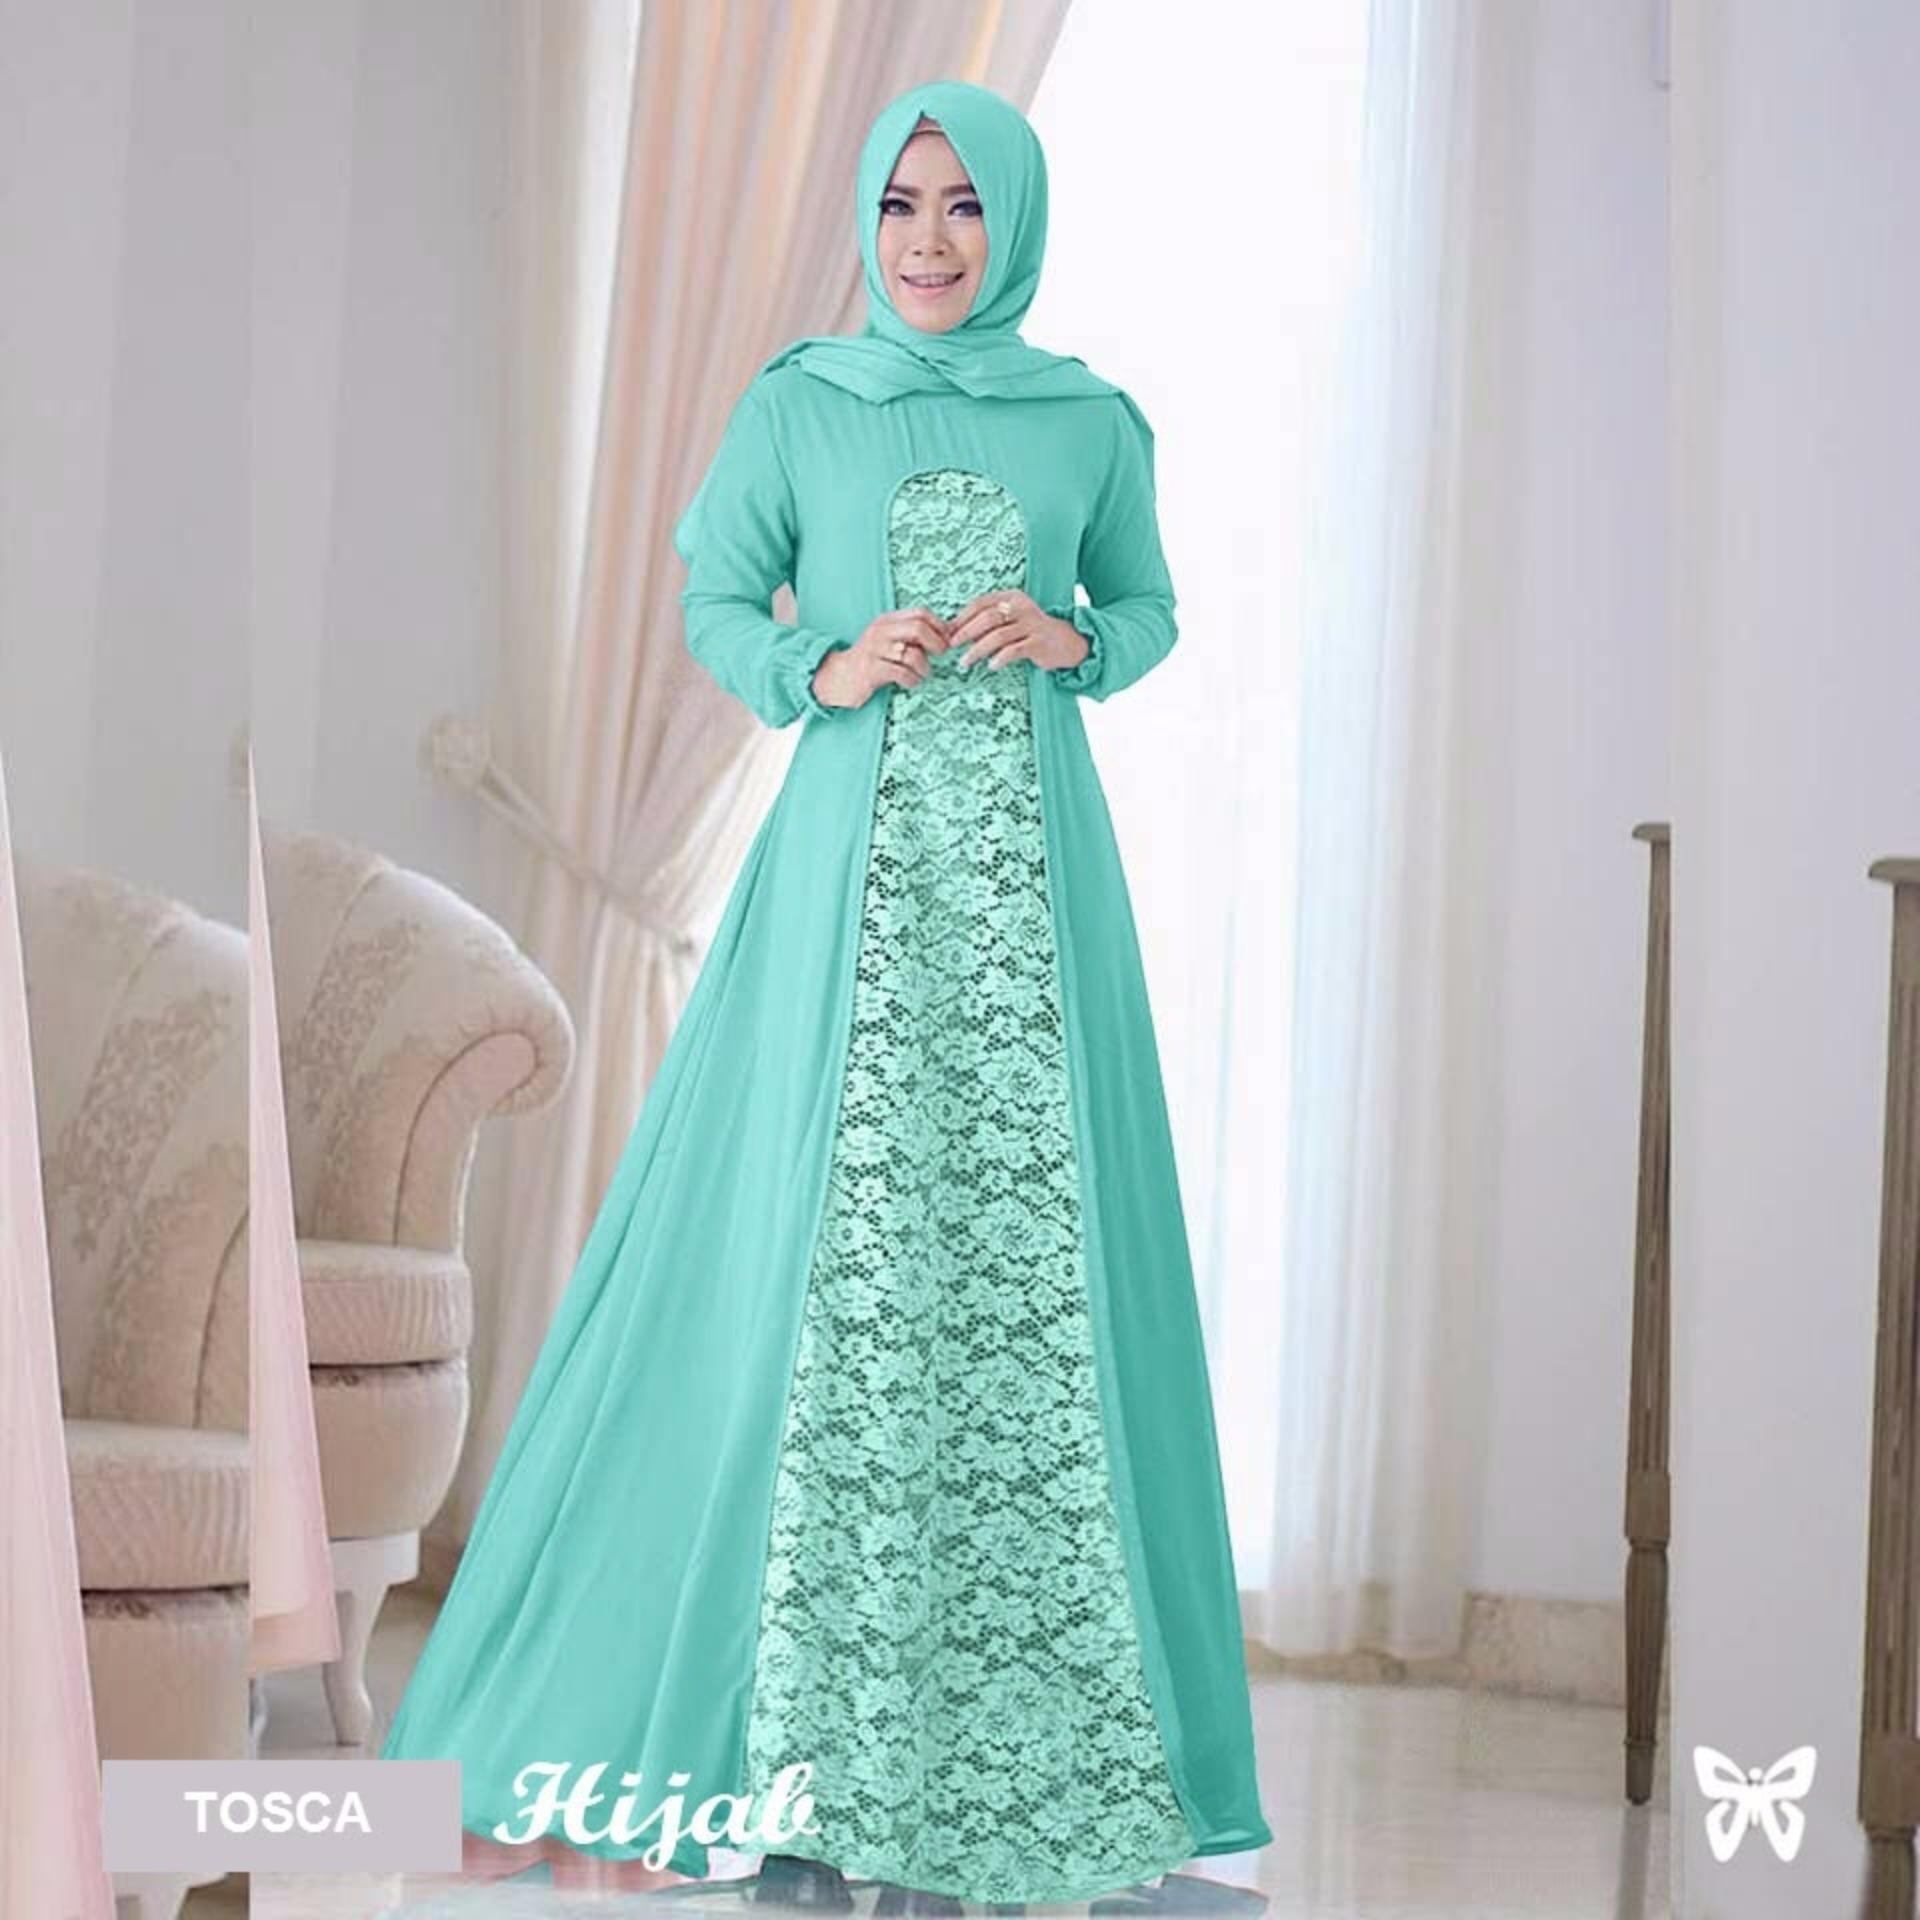 Maxi Dress Lengan Panjang Set 2 in 1 MSR057 / Gamis Syari / Gaun Pesta Muslimah / Baju Muslim Wanita Syar'i / Hijab Jilbab Pashmina / Srrayta